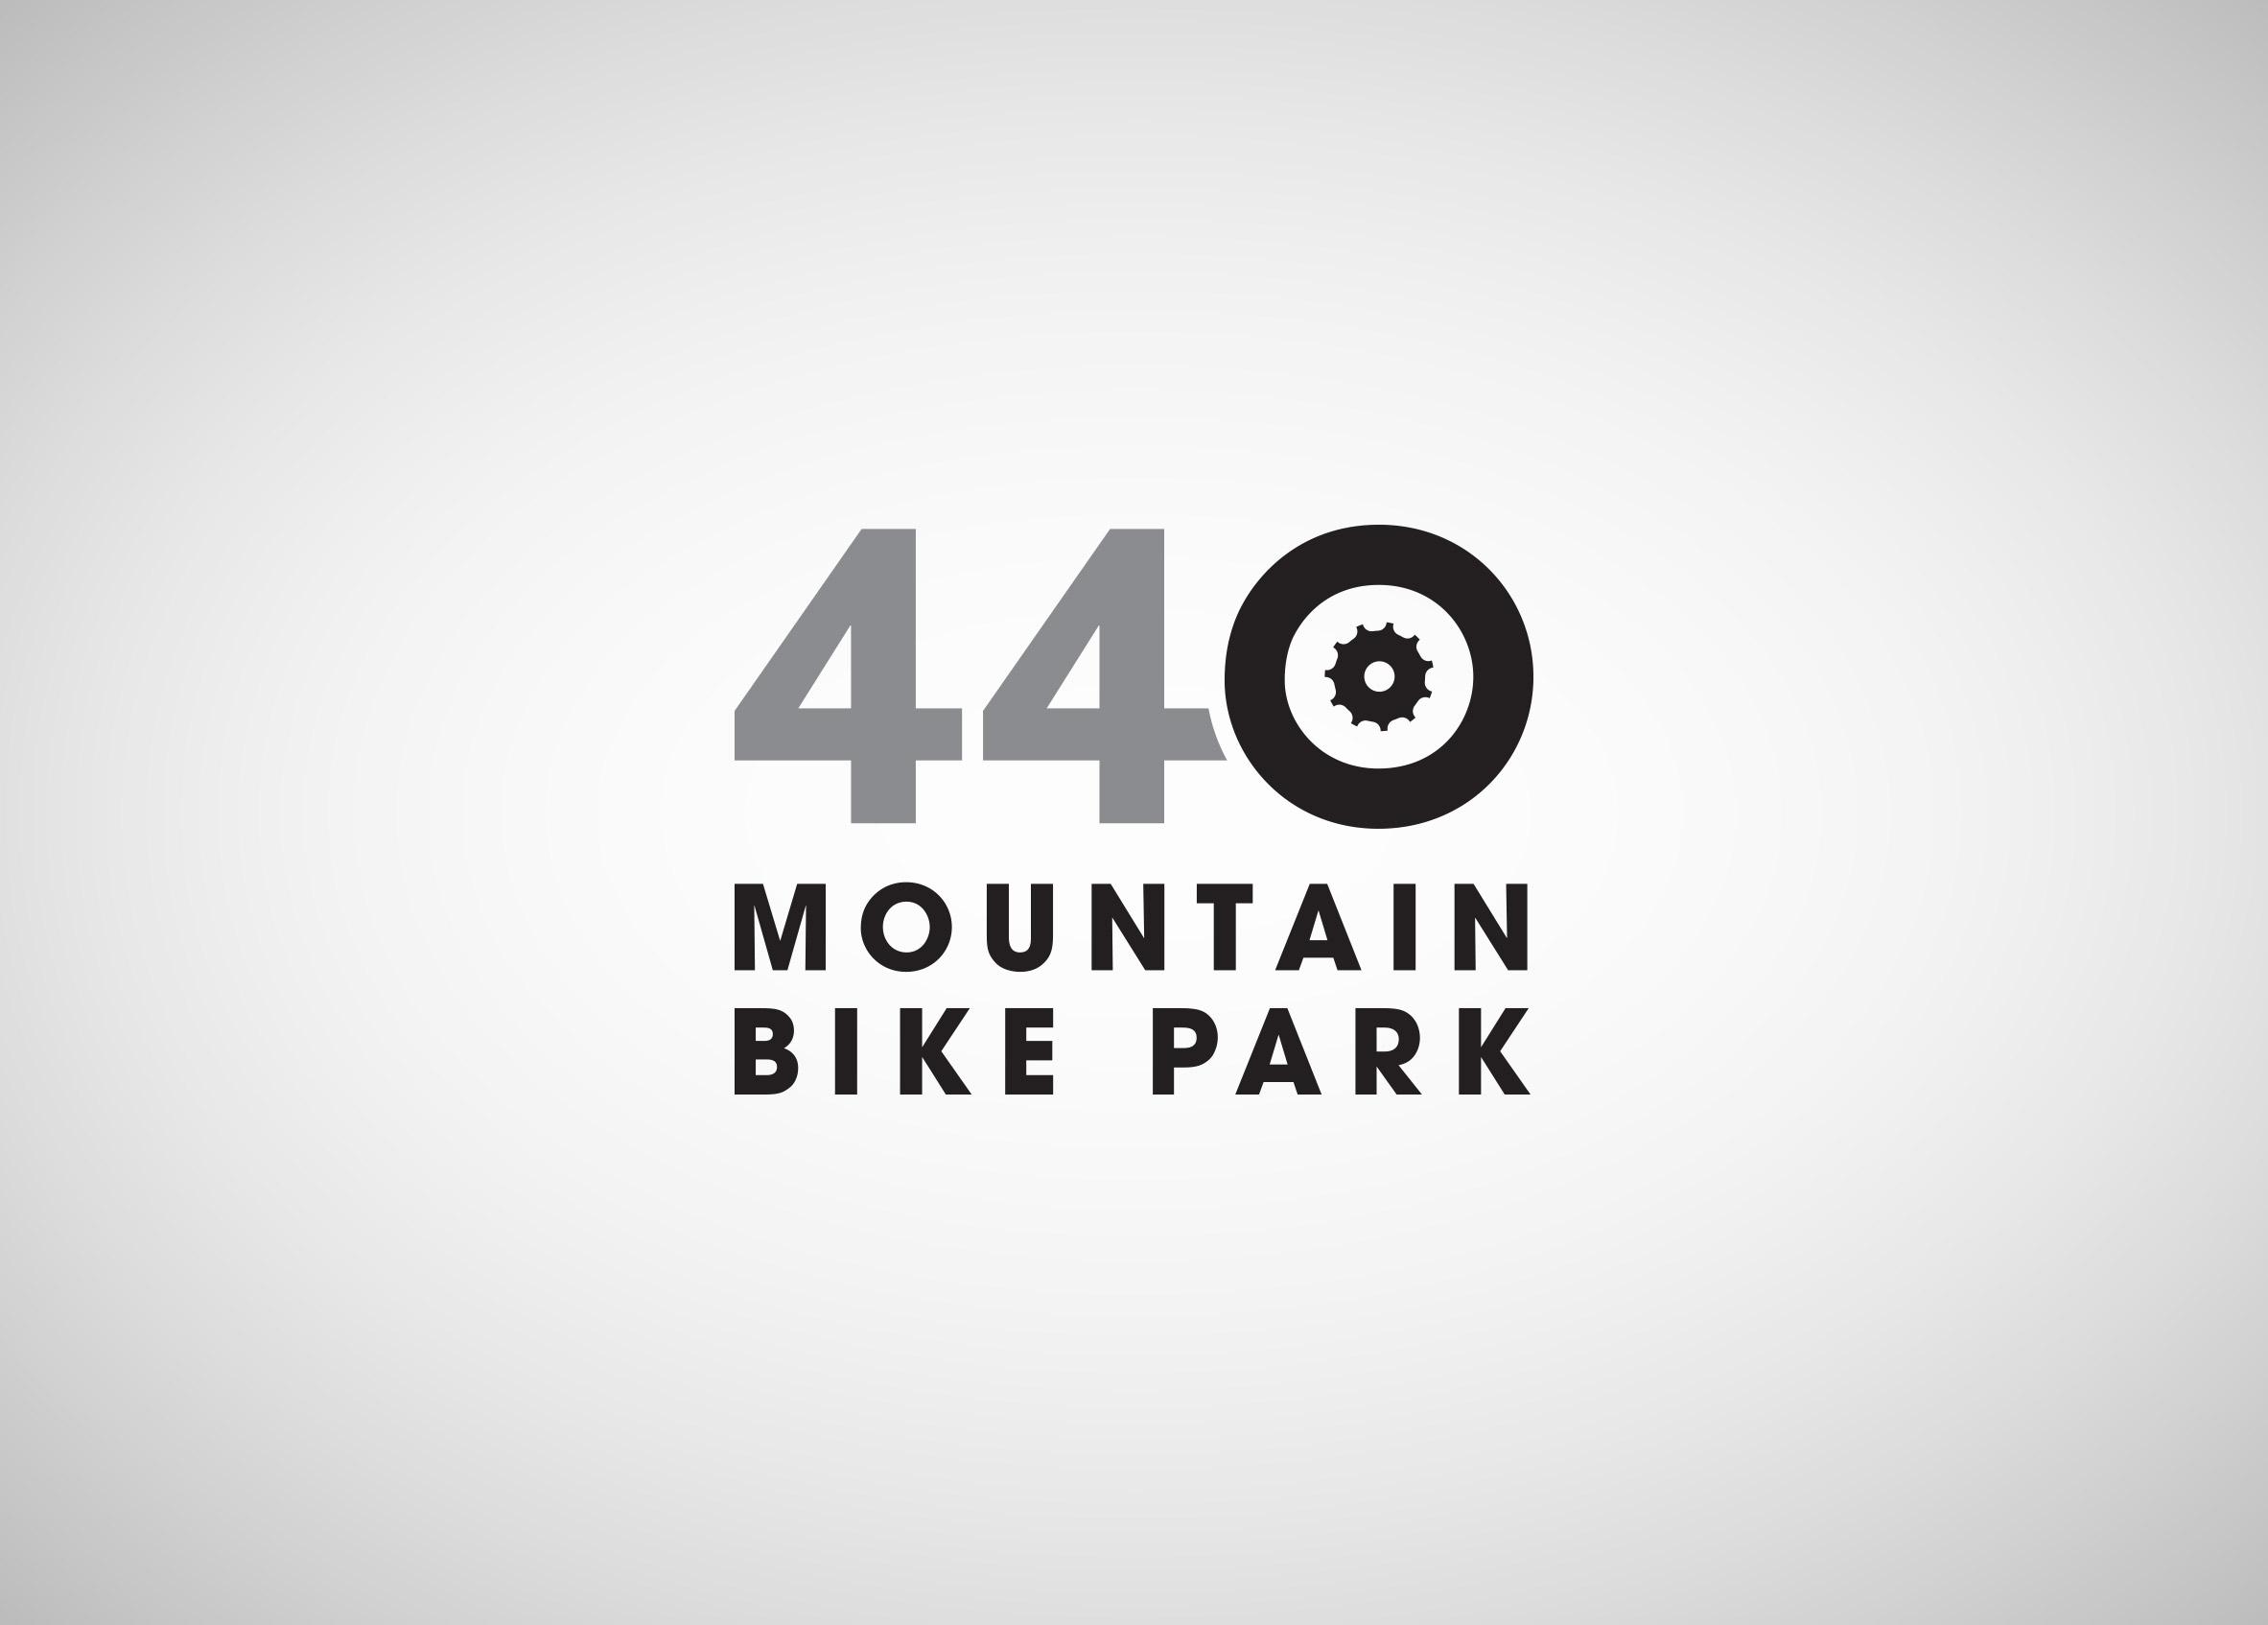 440-logo_variant.jpg